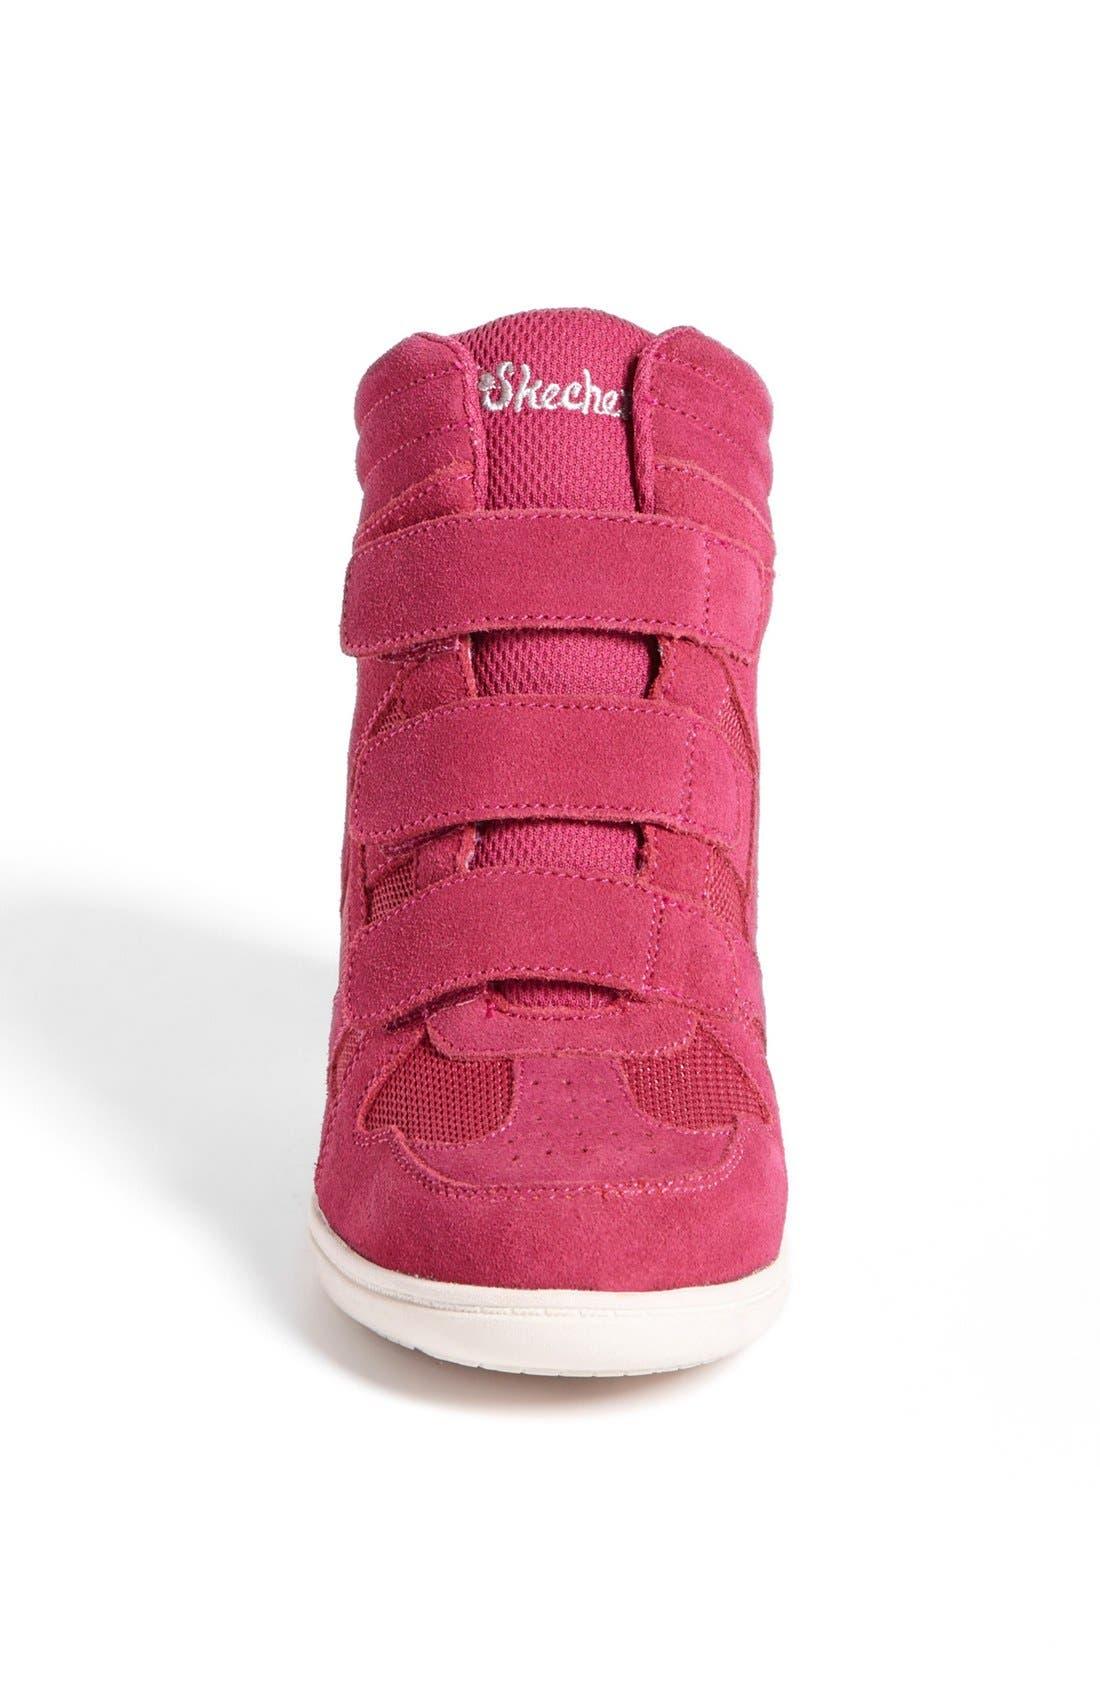 Alternate Image 3  - SKECHERS 'Double Trouble' Wedge Sneaker (Toddler, Little Kid & Big Kid)